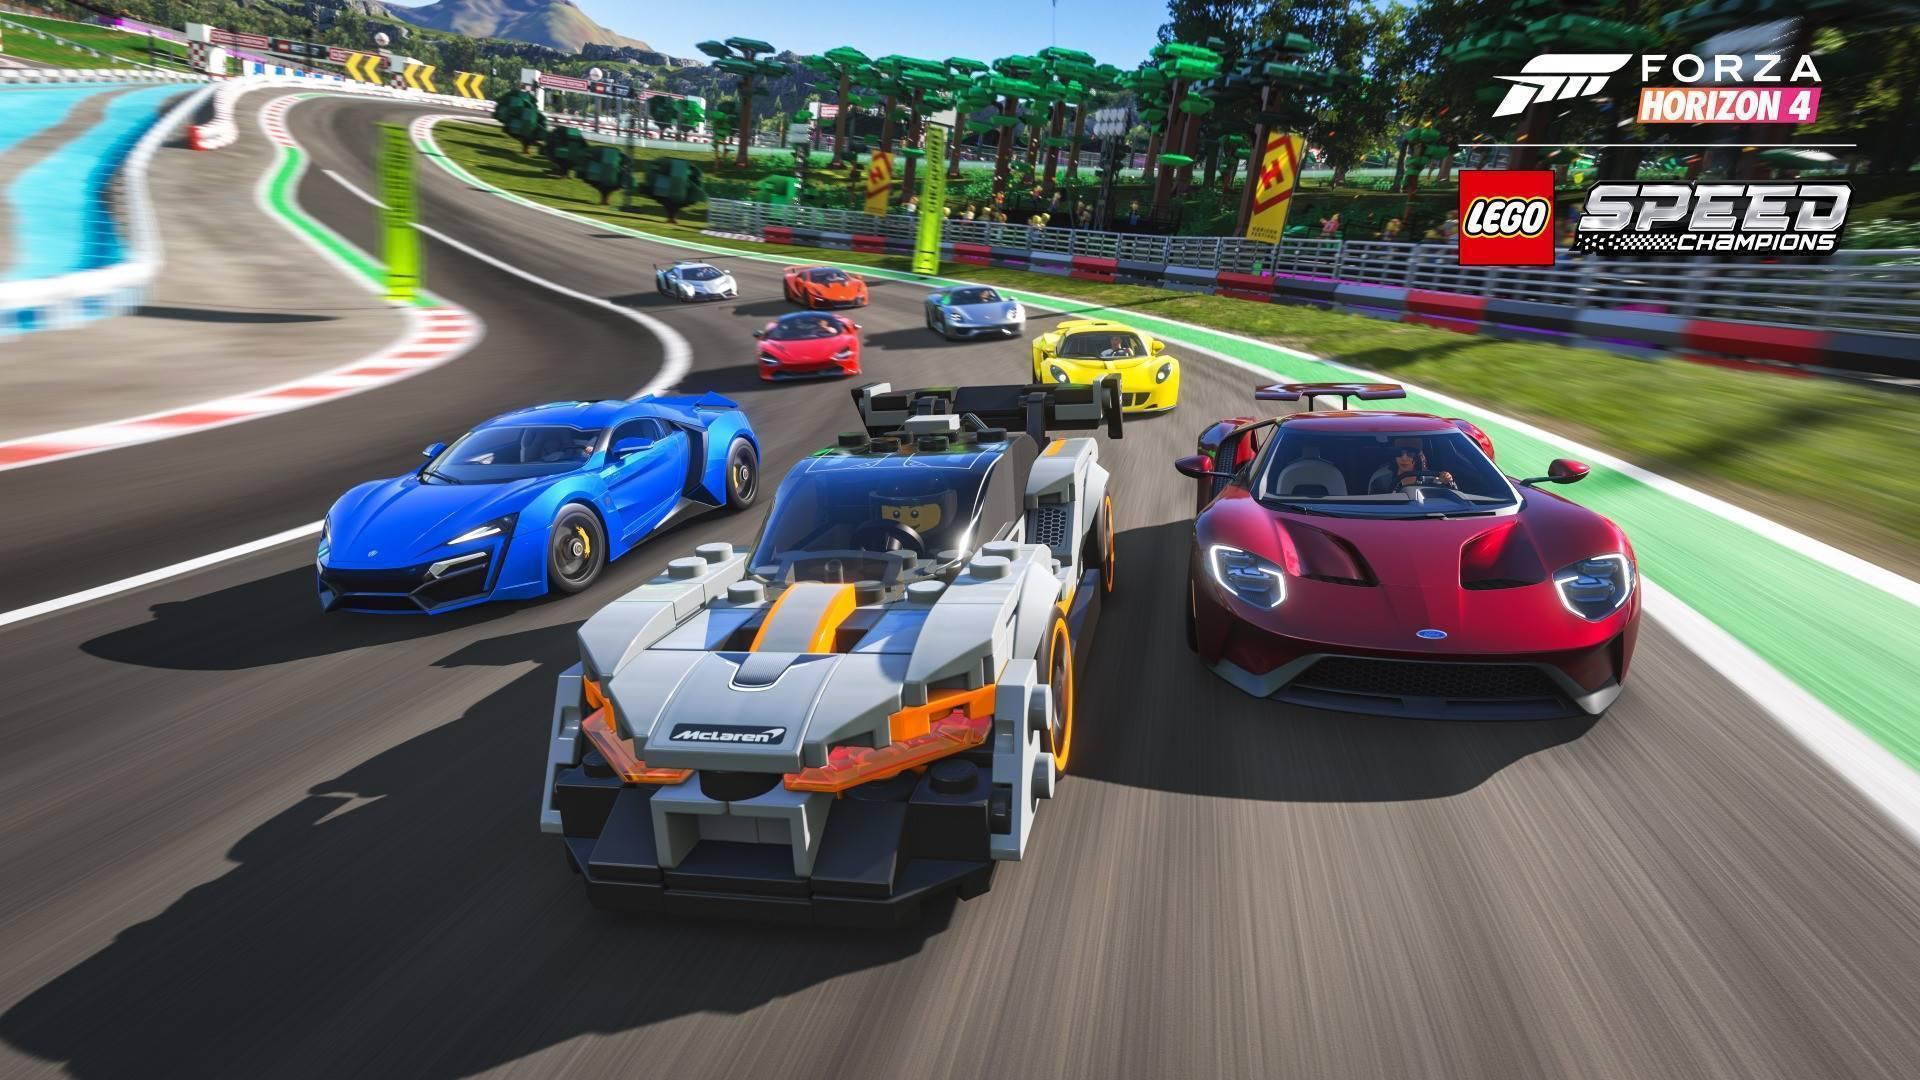 Buy Forza Horizon 4 Lego Speed Champions Pc Cd Key Compare Prices